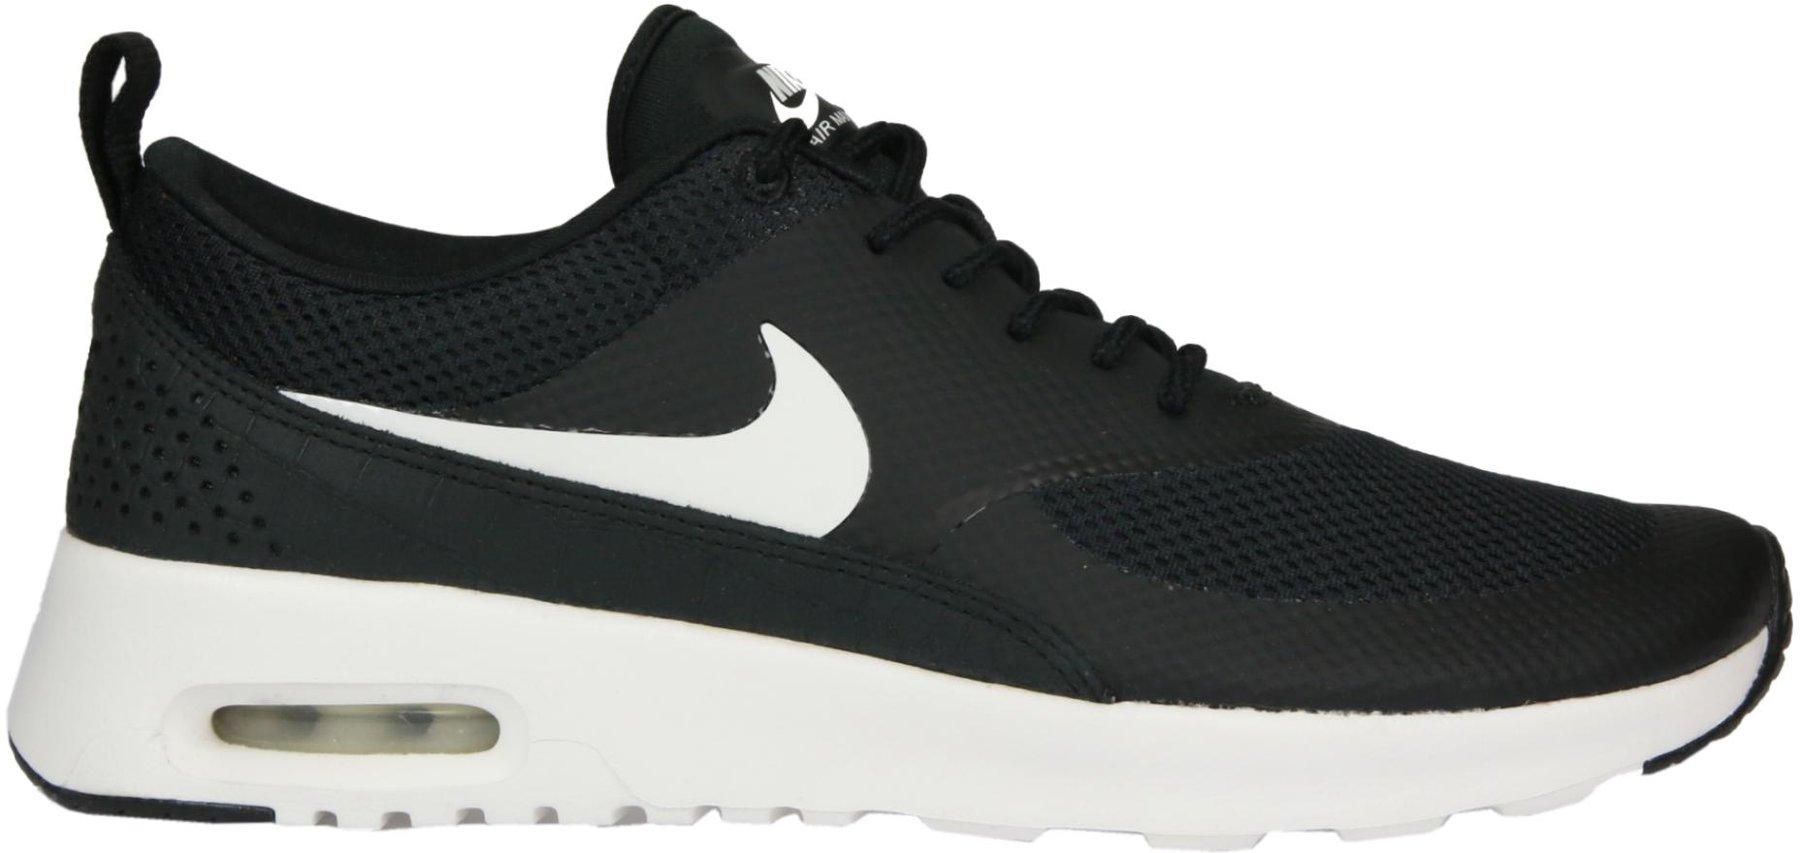 premium selection 0dc53 e6832 Nike Air Max Thea black/summit white günstig kaufen